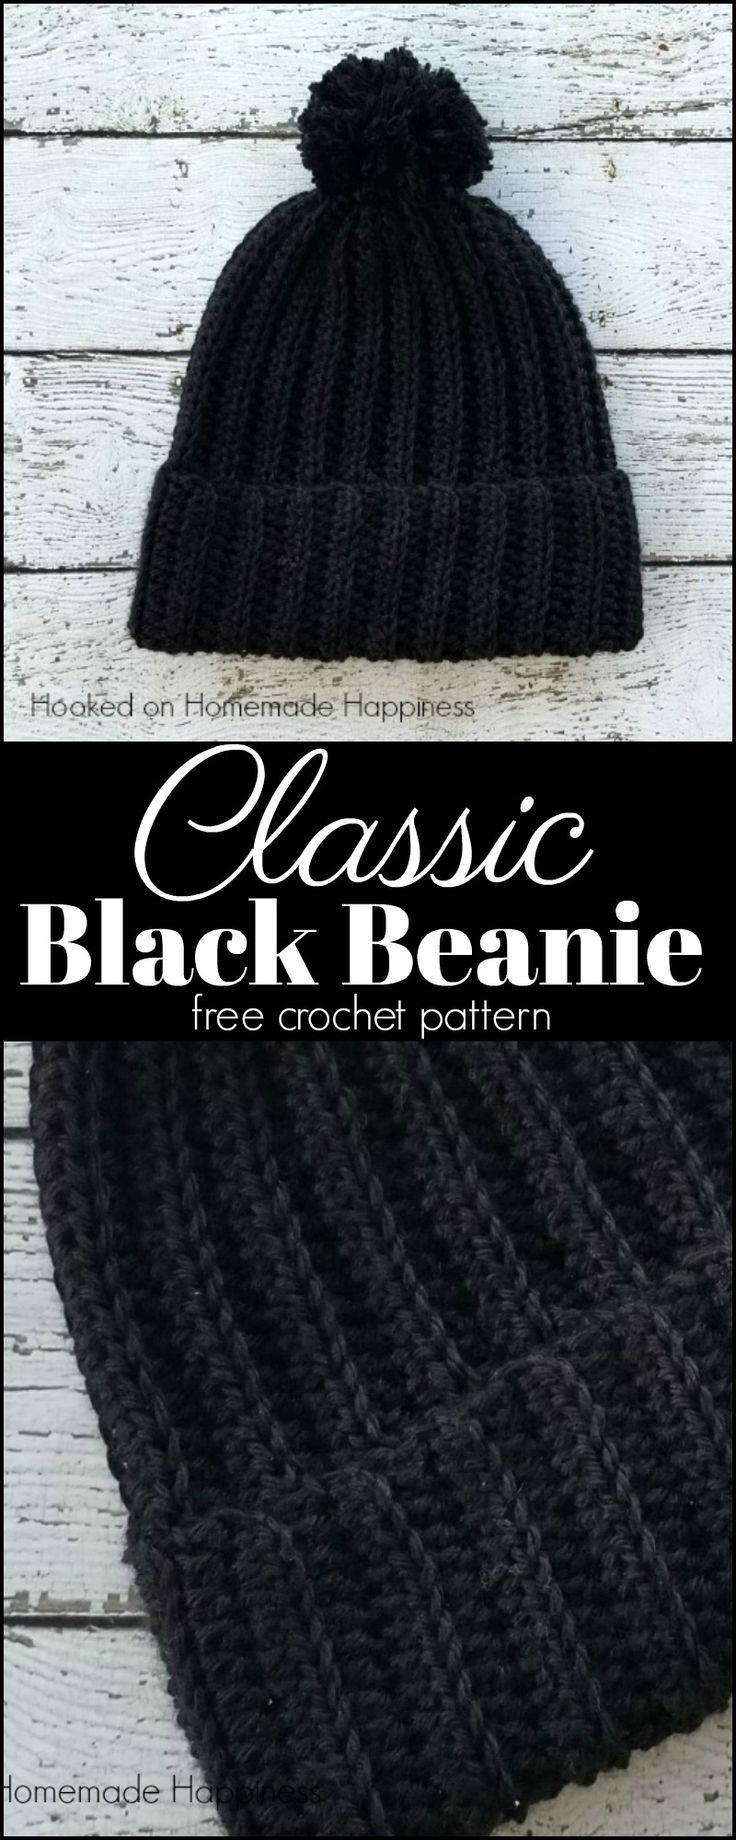 Classic Beanie Crochet Pattern